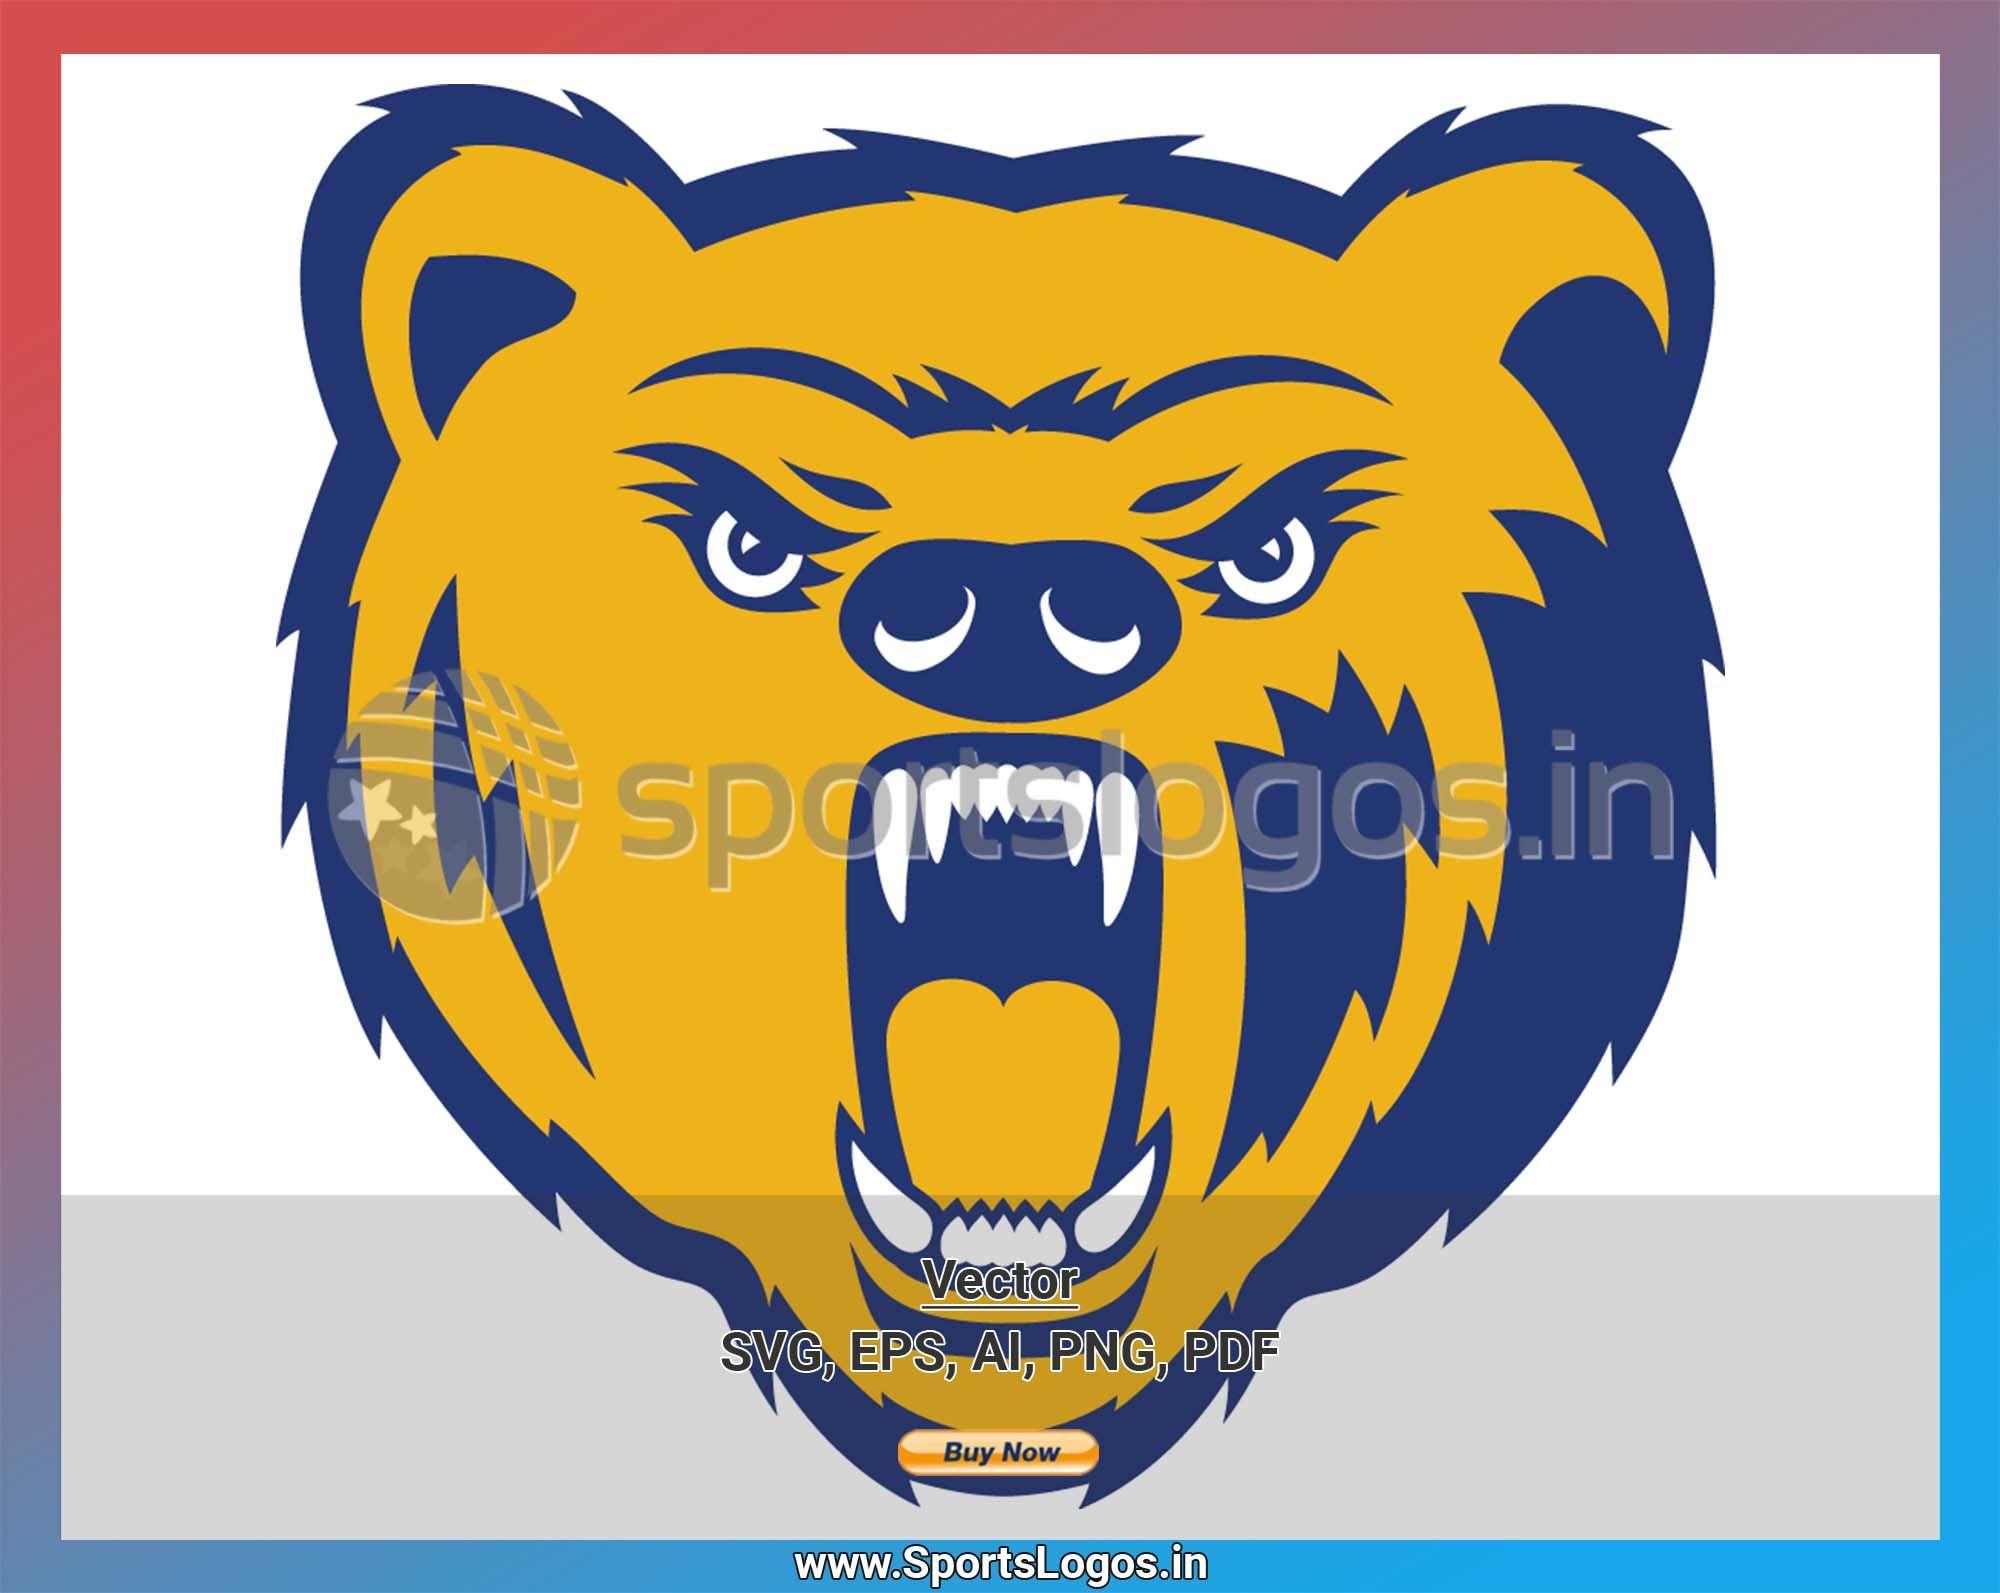 Northern Colorado Bears 20102014, NCAA Division I (nr